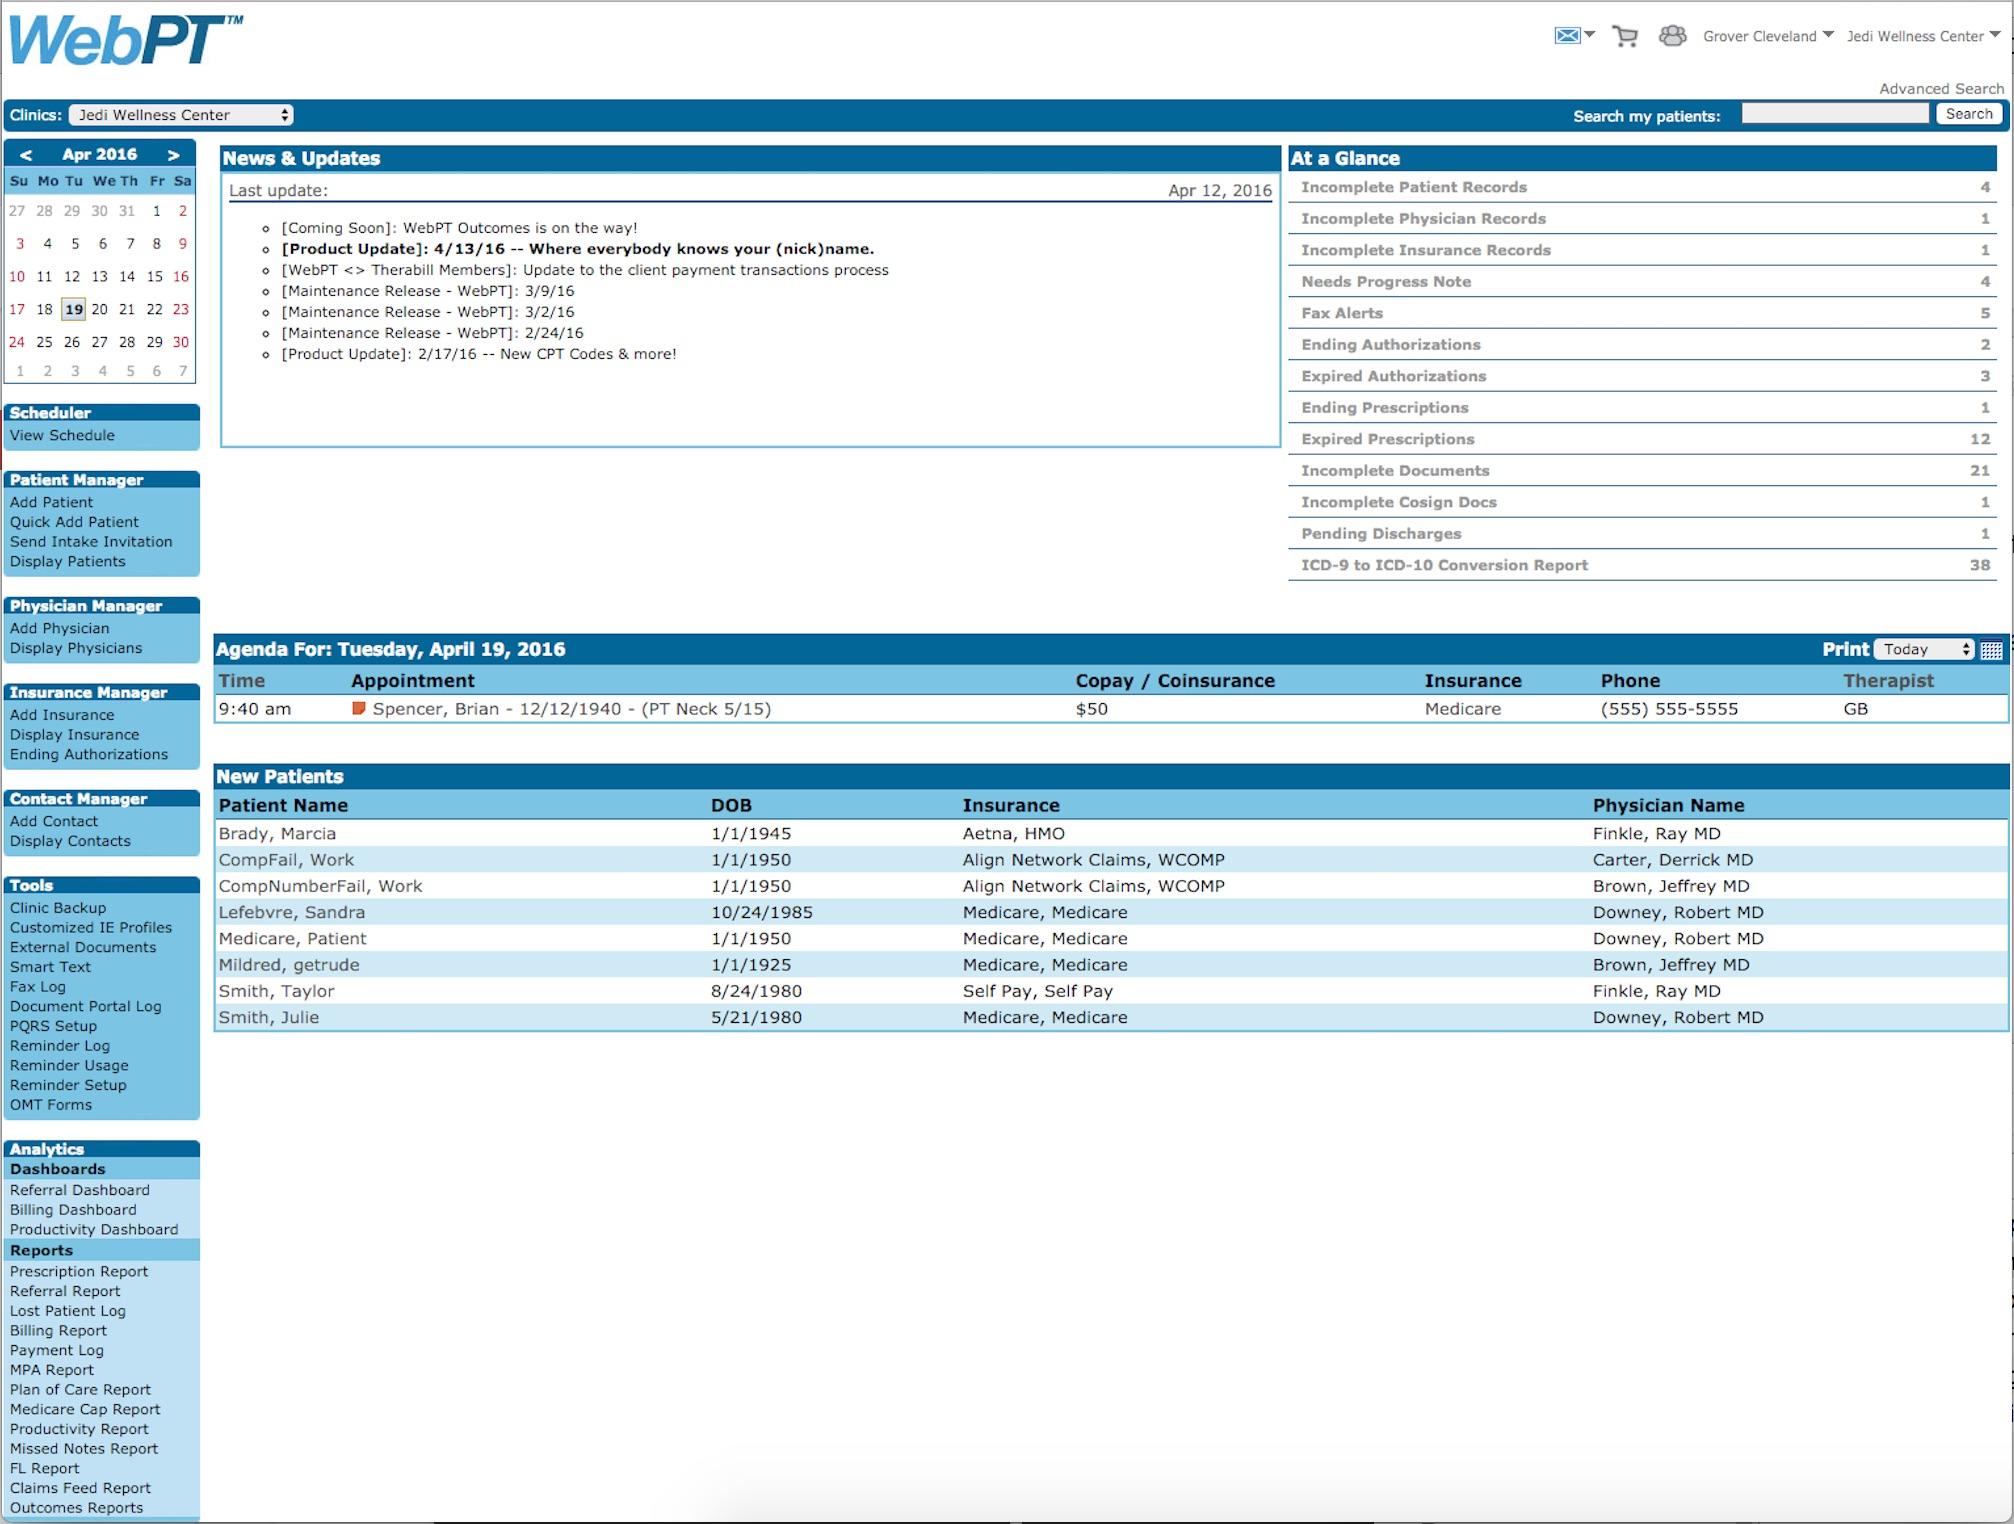 WebPT Dashboard & Daily Agenda